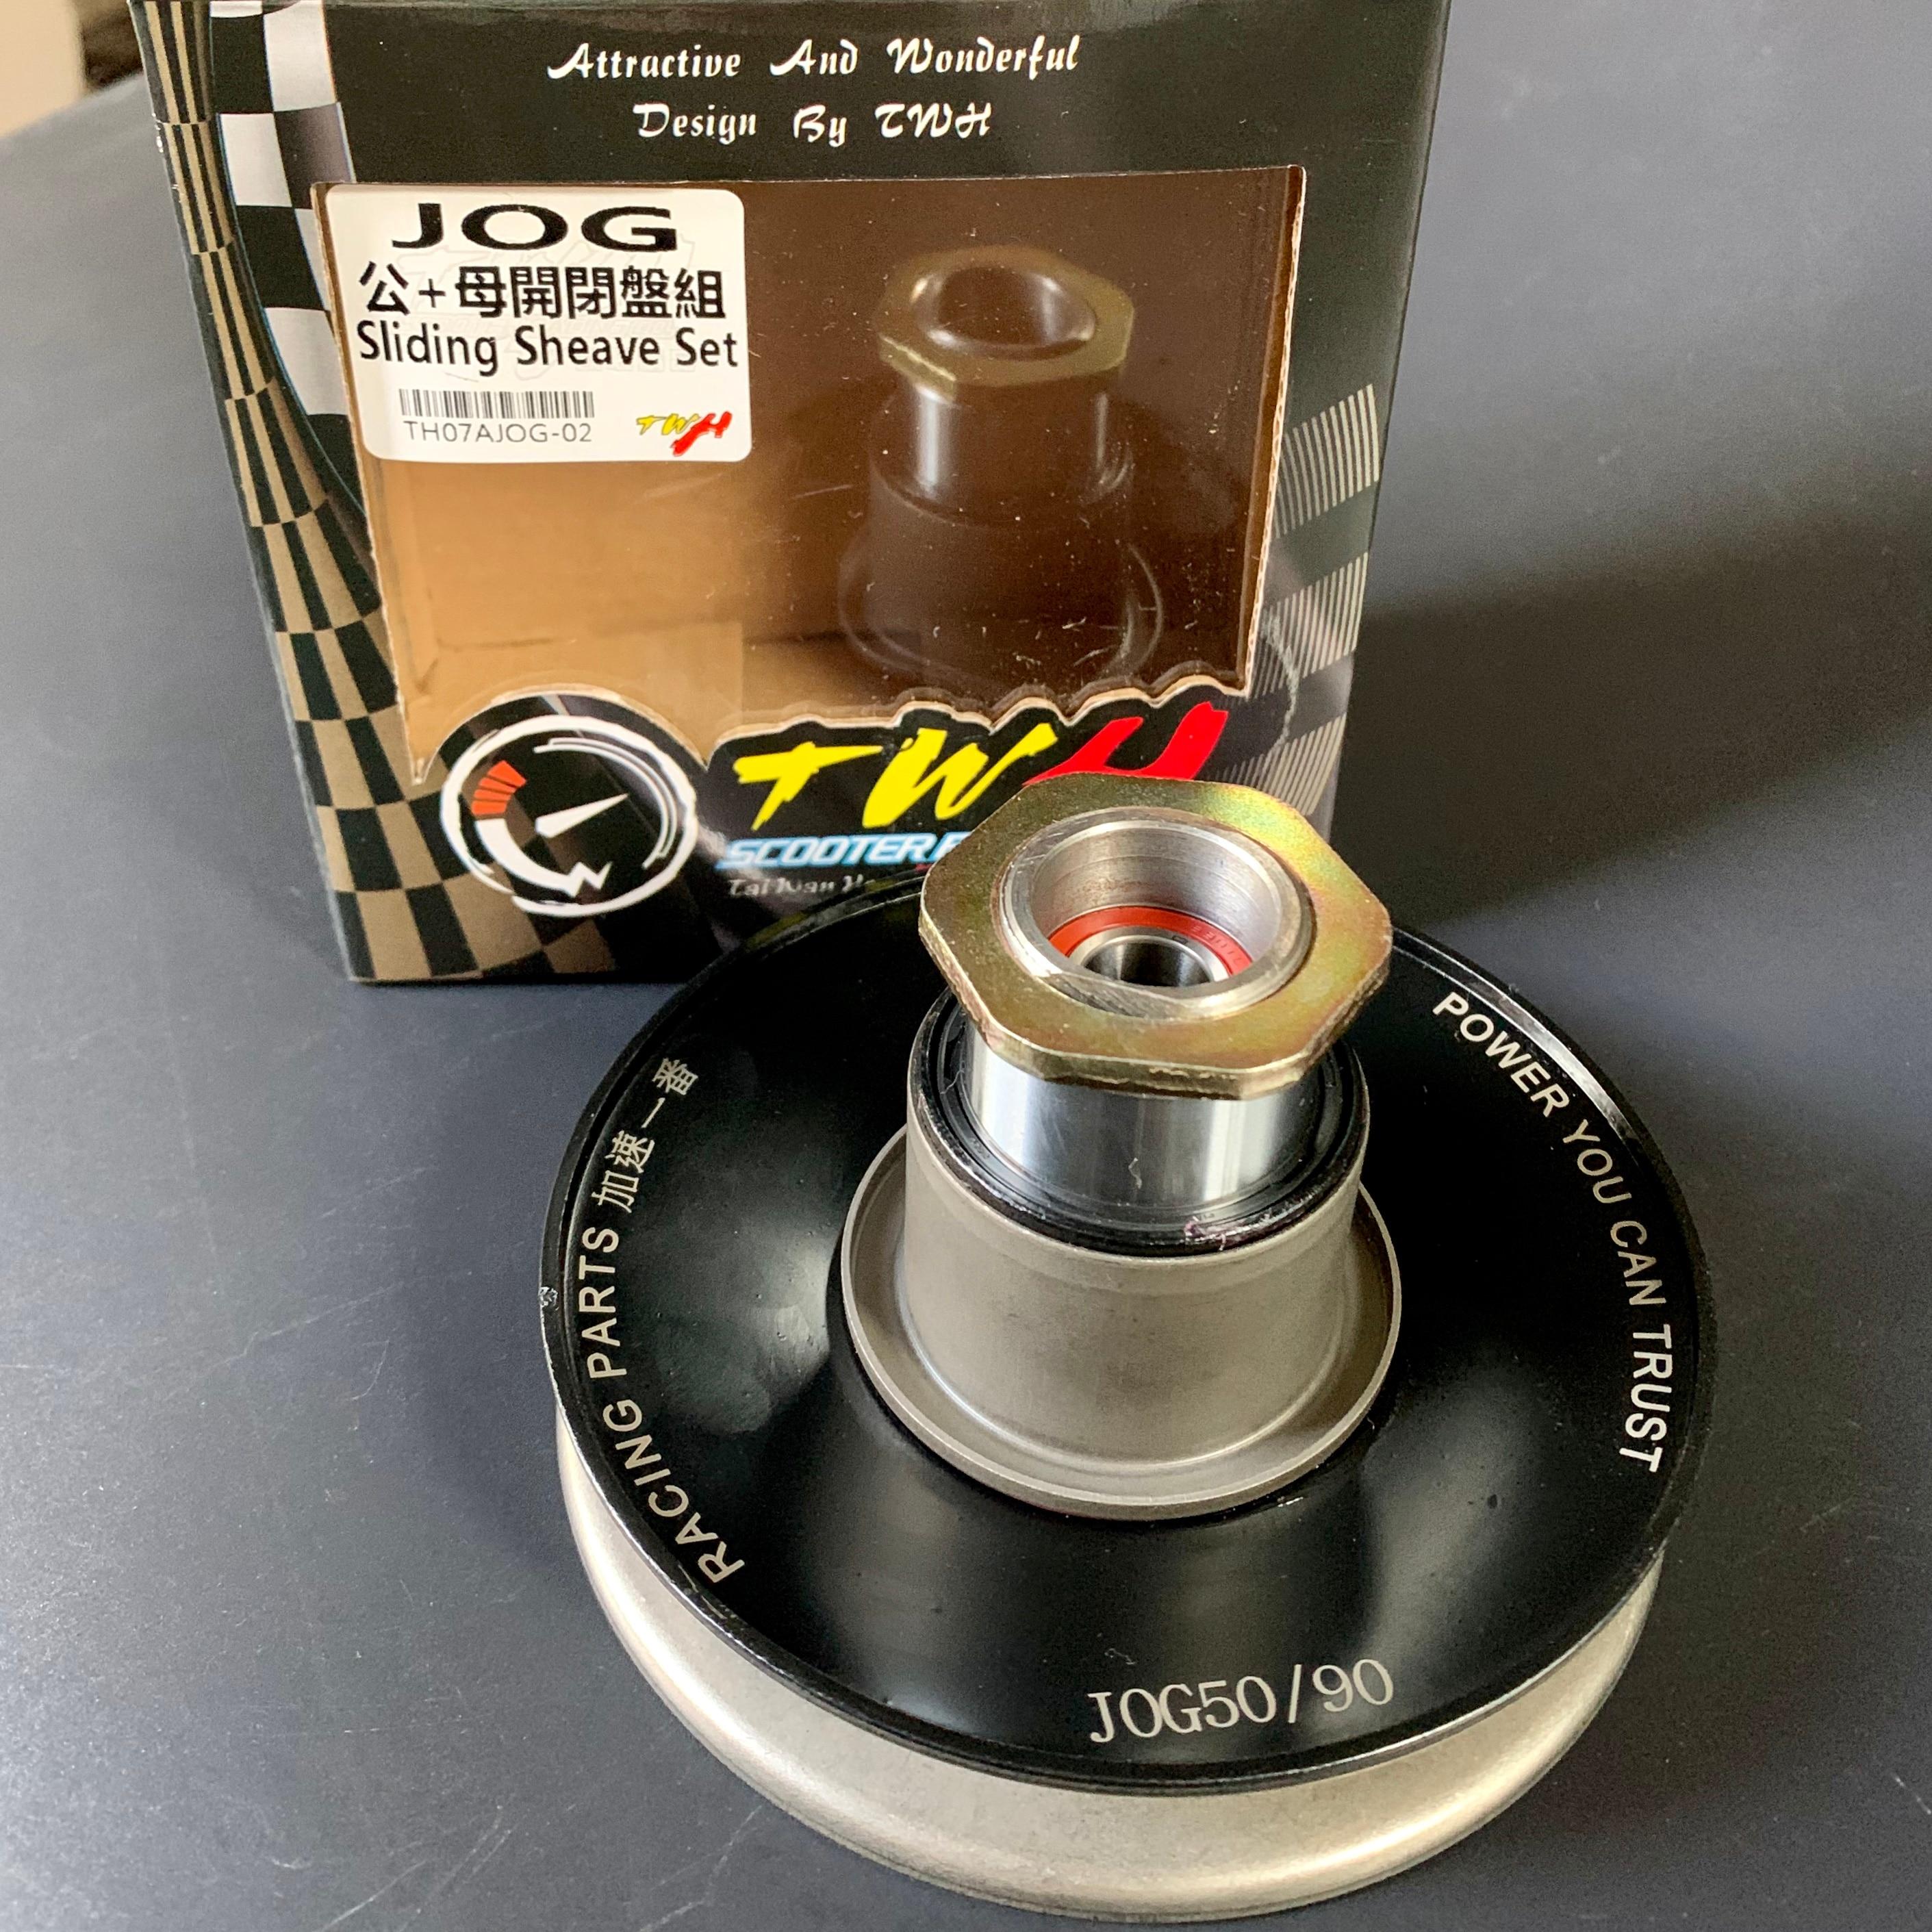 Torque Driver JOG50 JOG100 MIO115 BWS100 RS100 AXIS100 Sport Pulleys Sliding Sheave Racing Tuning Parts Jog Bws 50 90 100